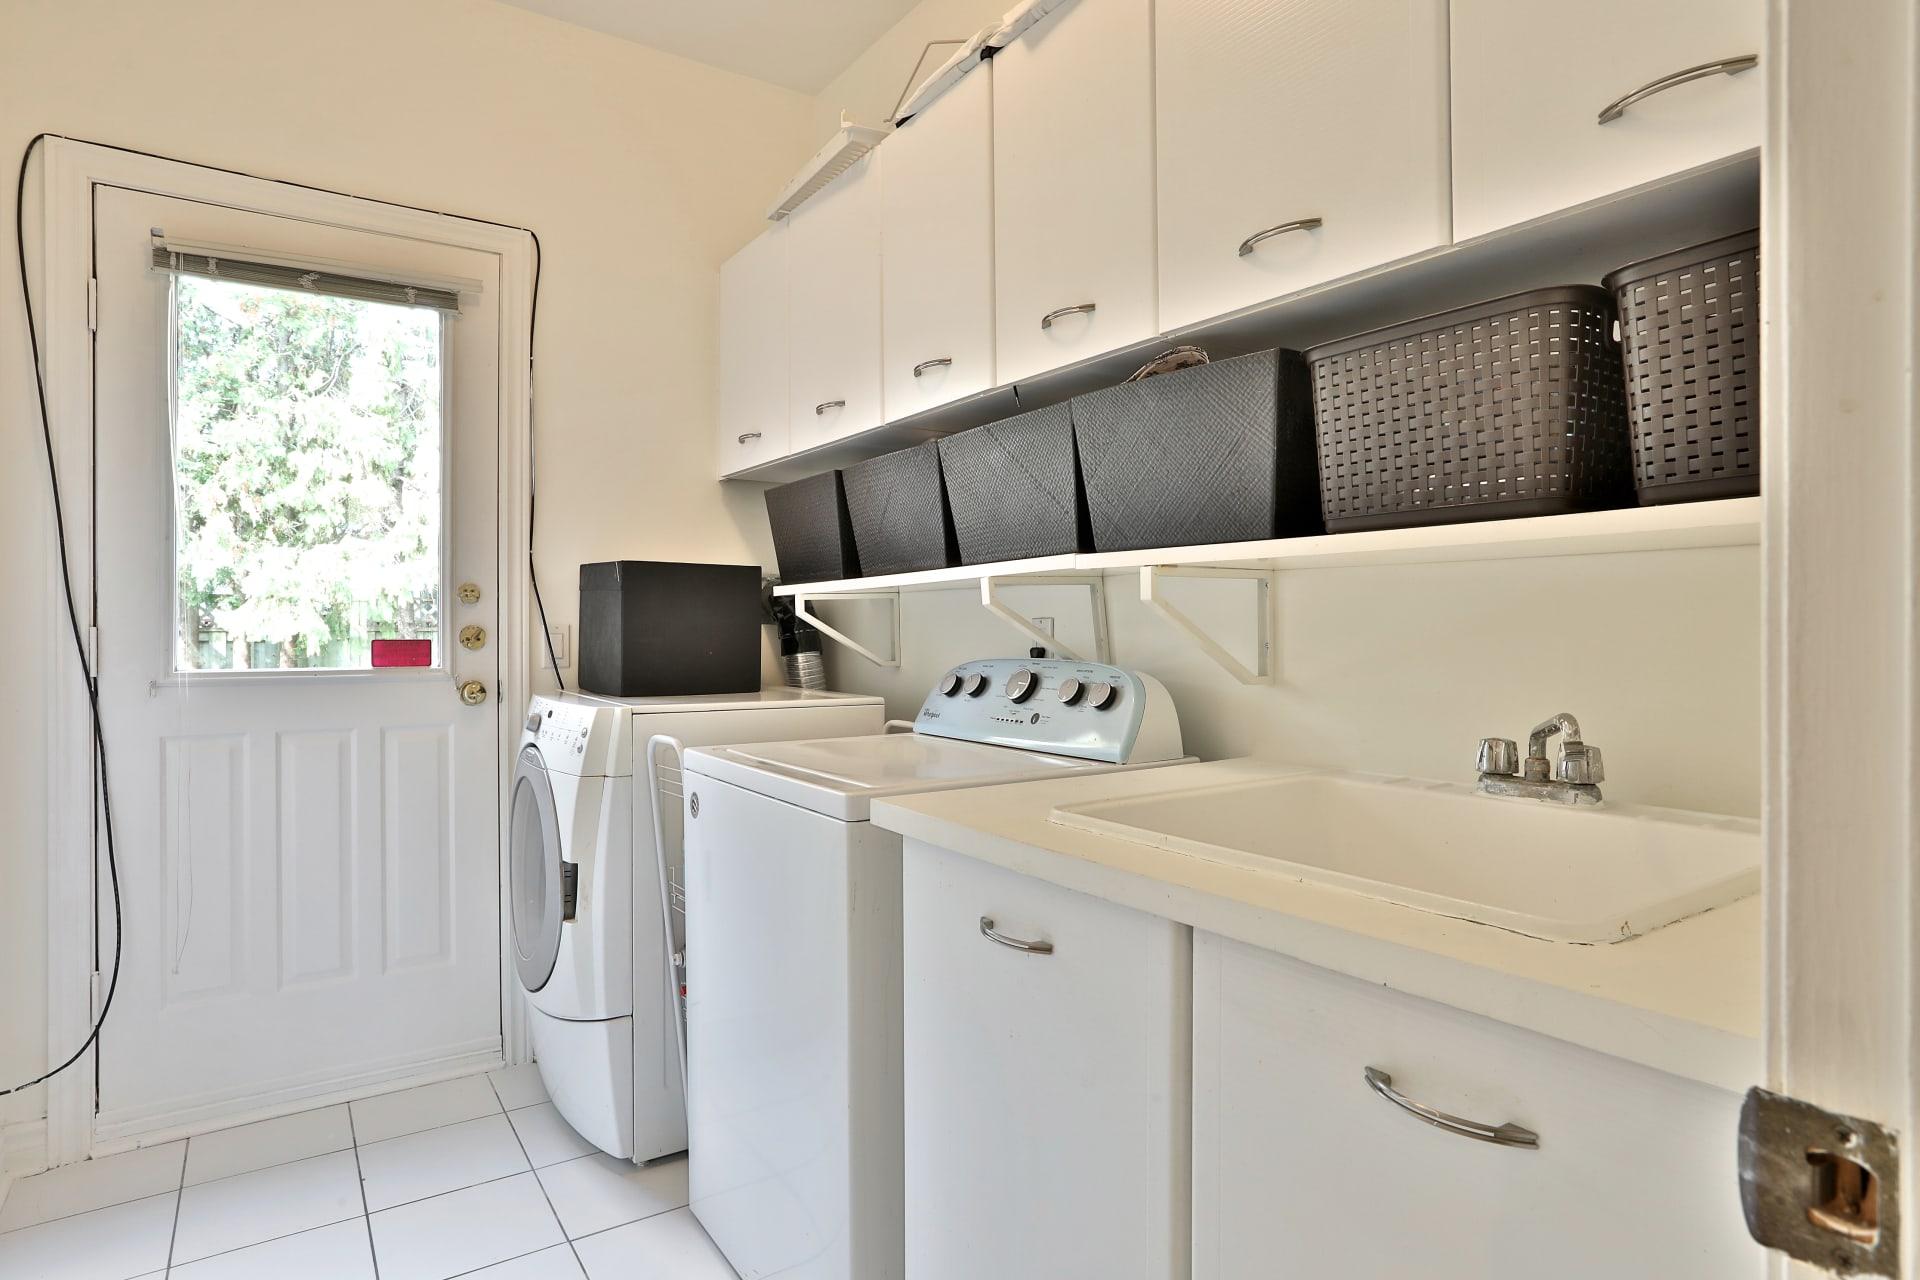 Sold: Desirable Westmount/Wilshire Enclave